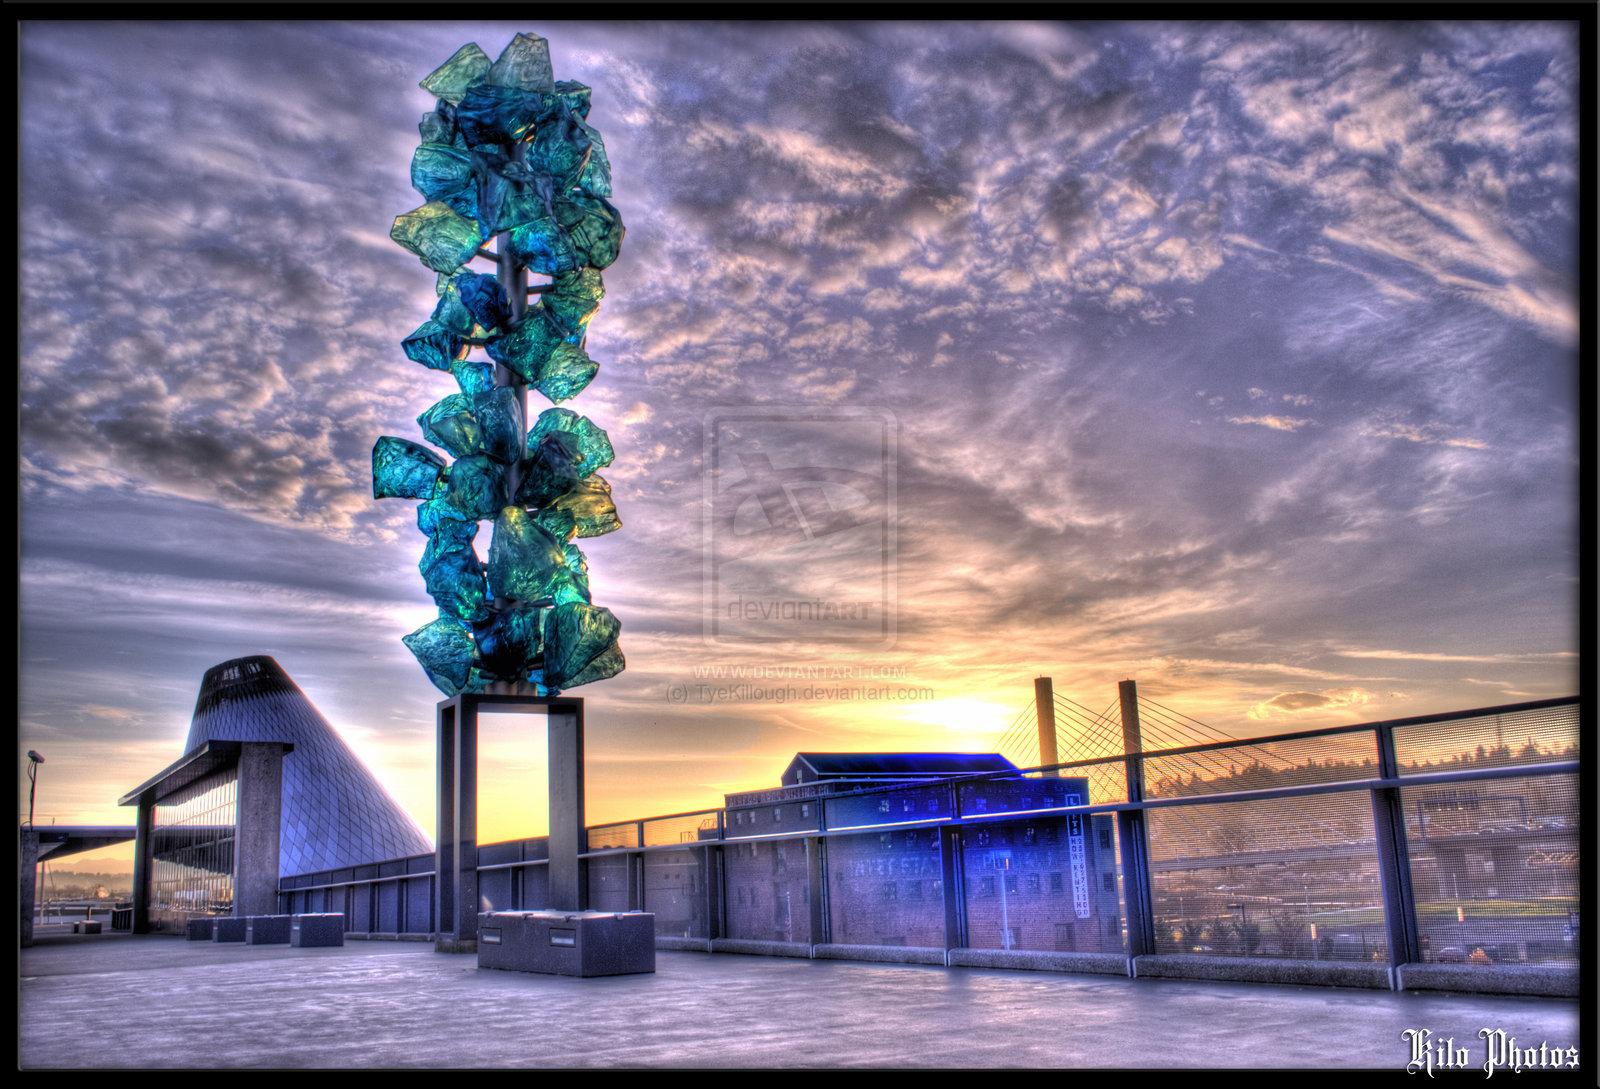 Glass Art Downtown Tacoma Washington by TyeKillough 1600x1089